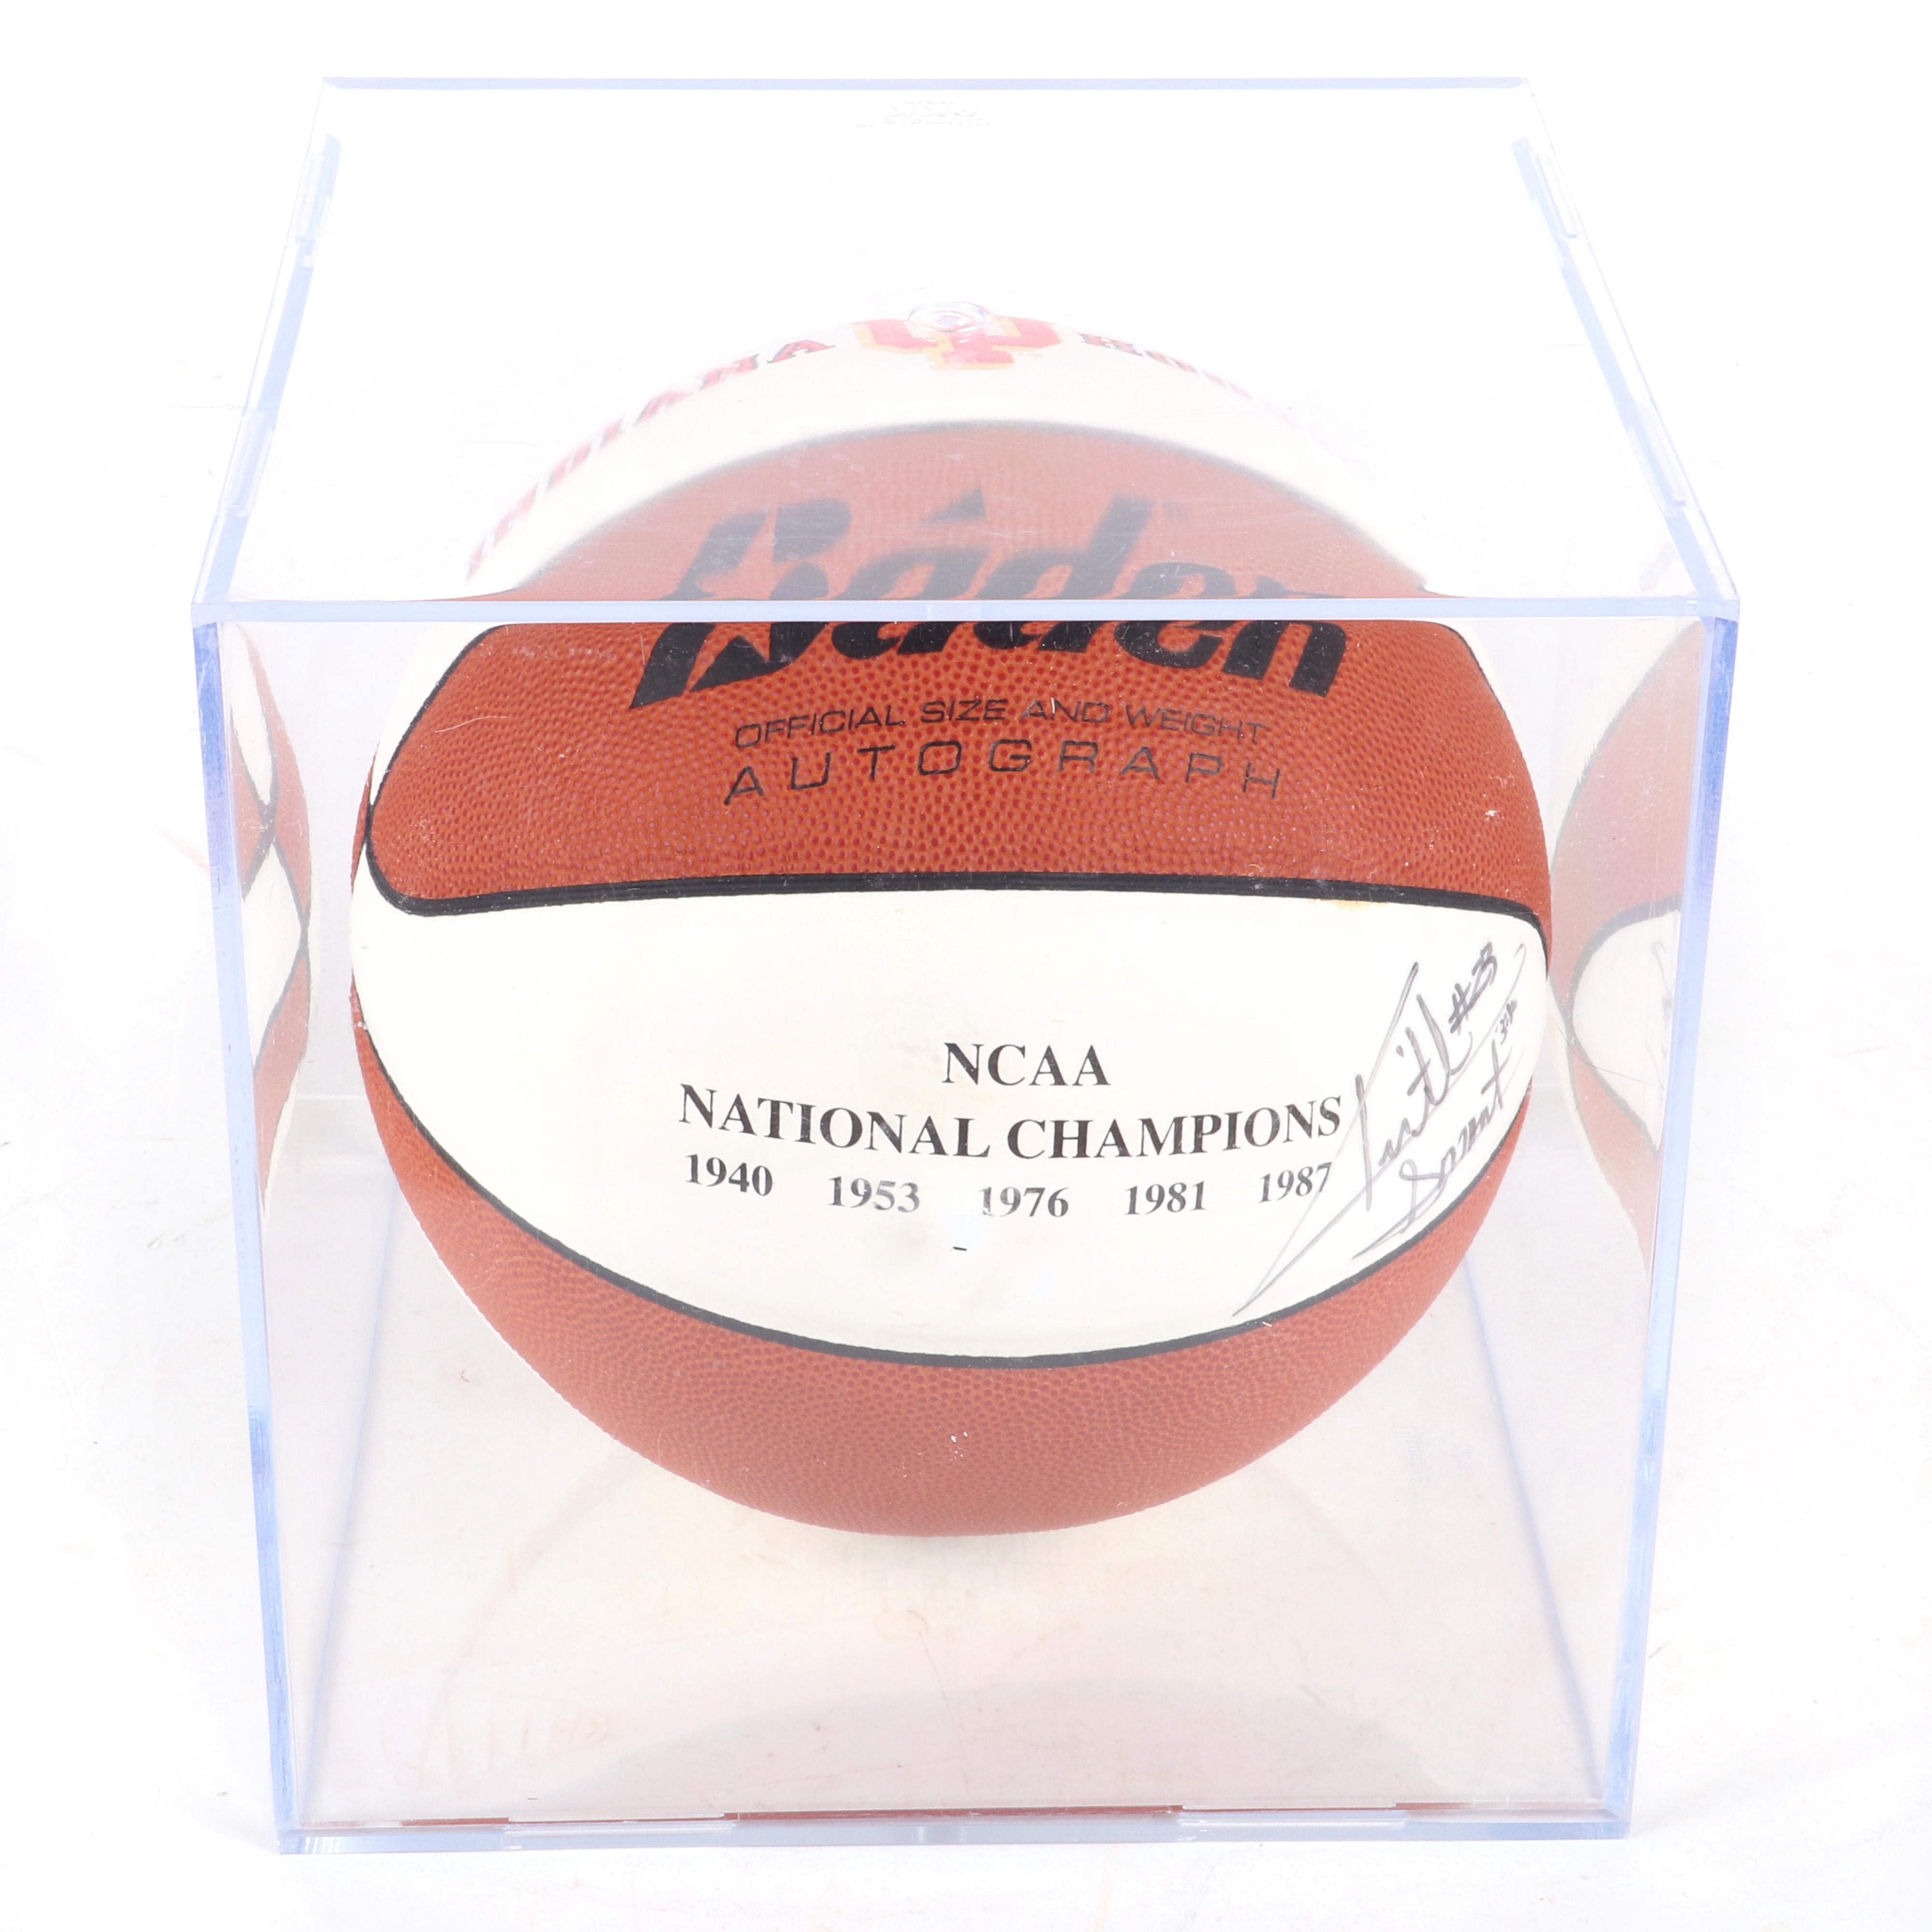 Keith Smart Autographed Indiana University NCAA Champs Logo Basketball